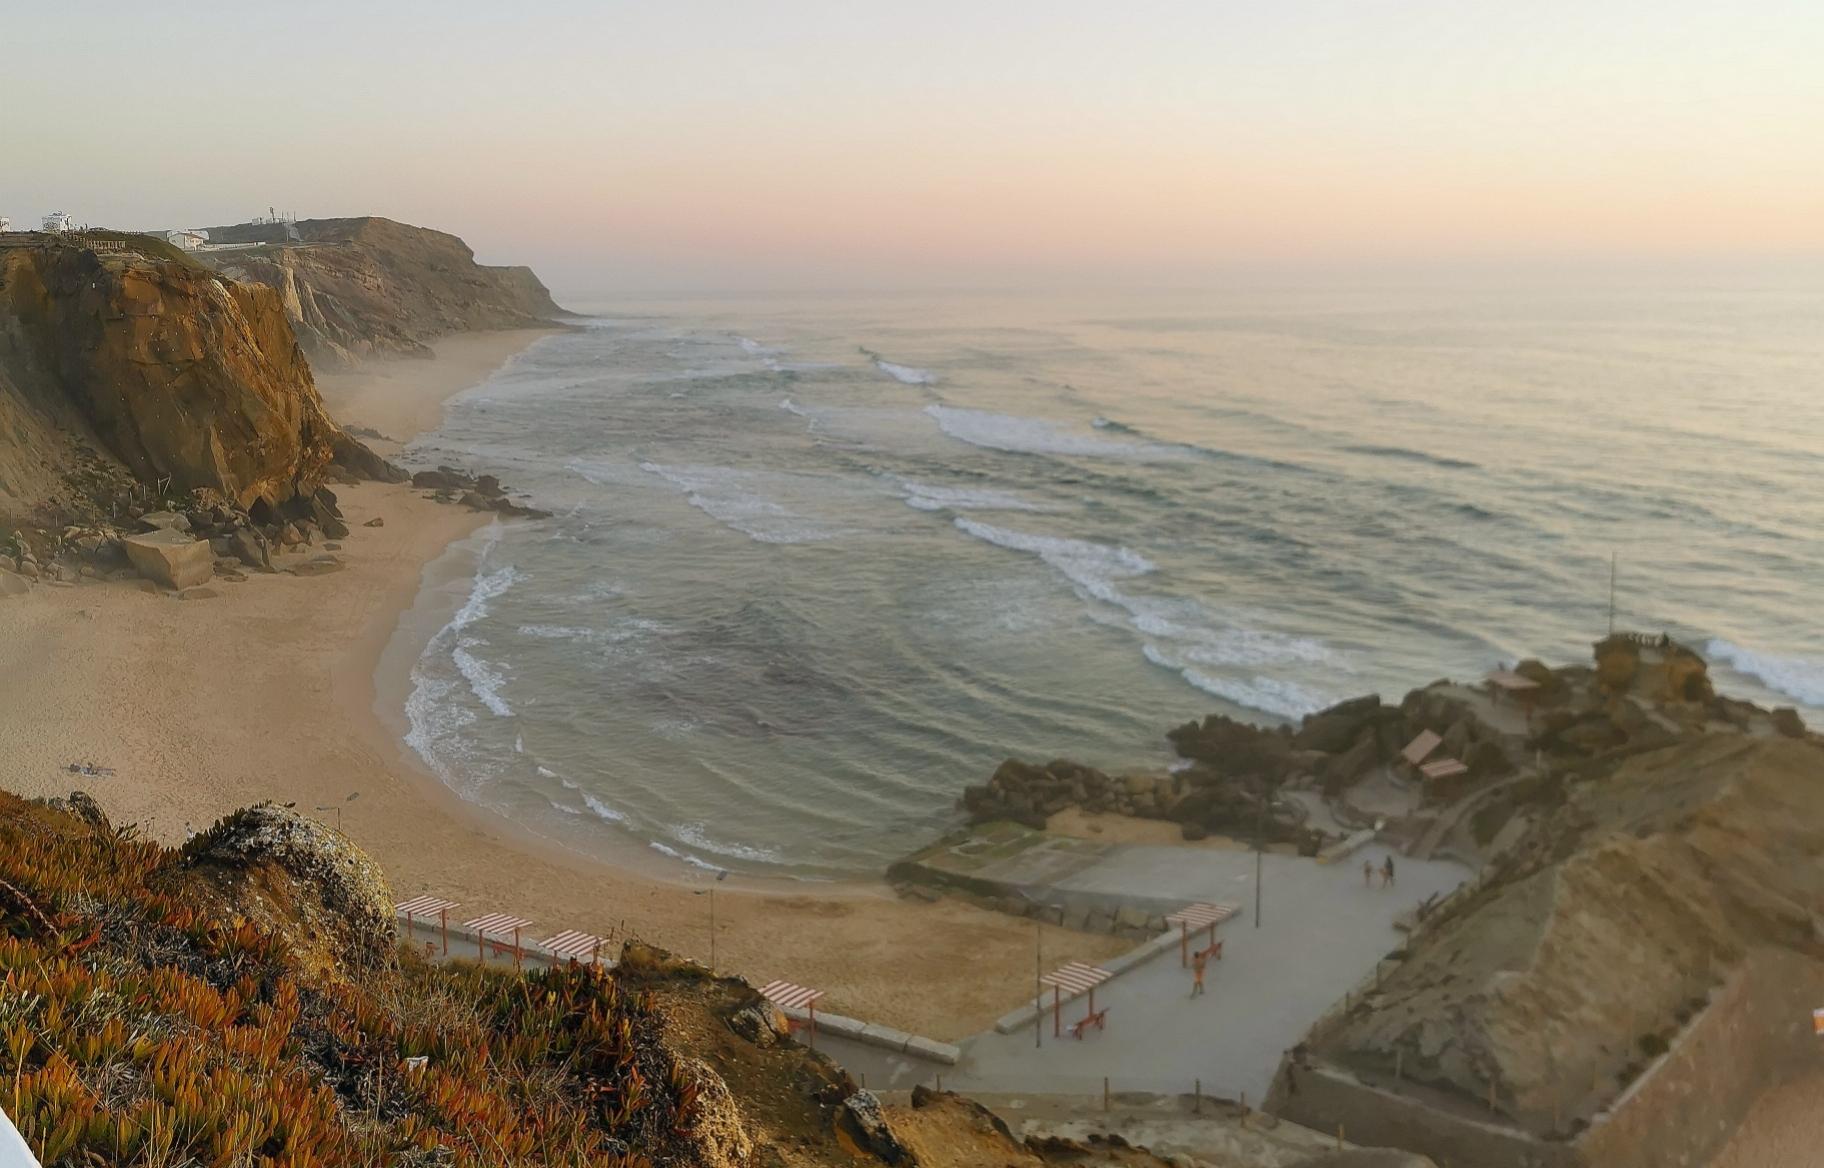 Praia de Sana Cruz, Portugal